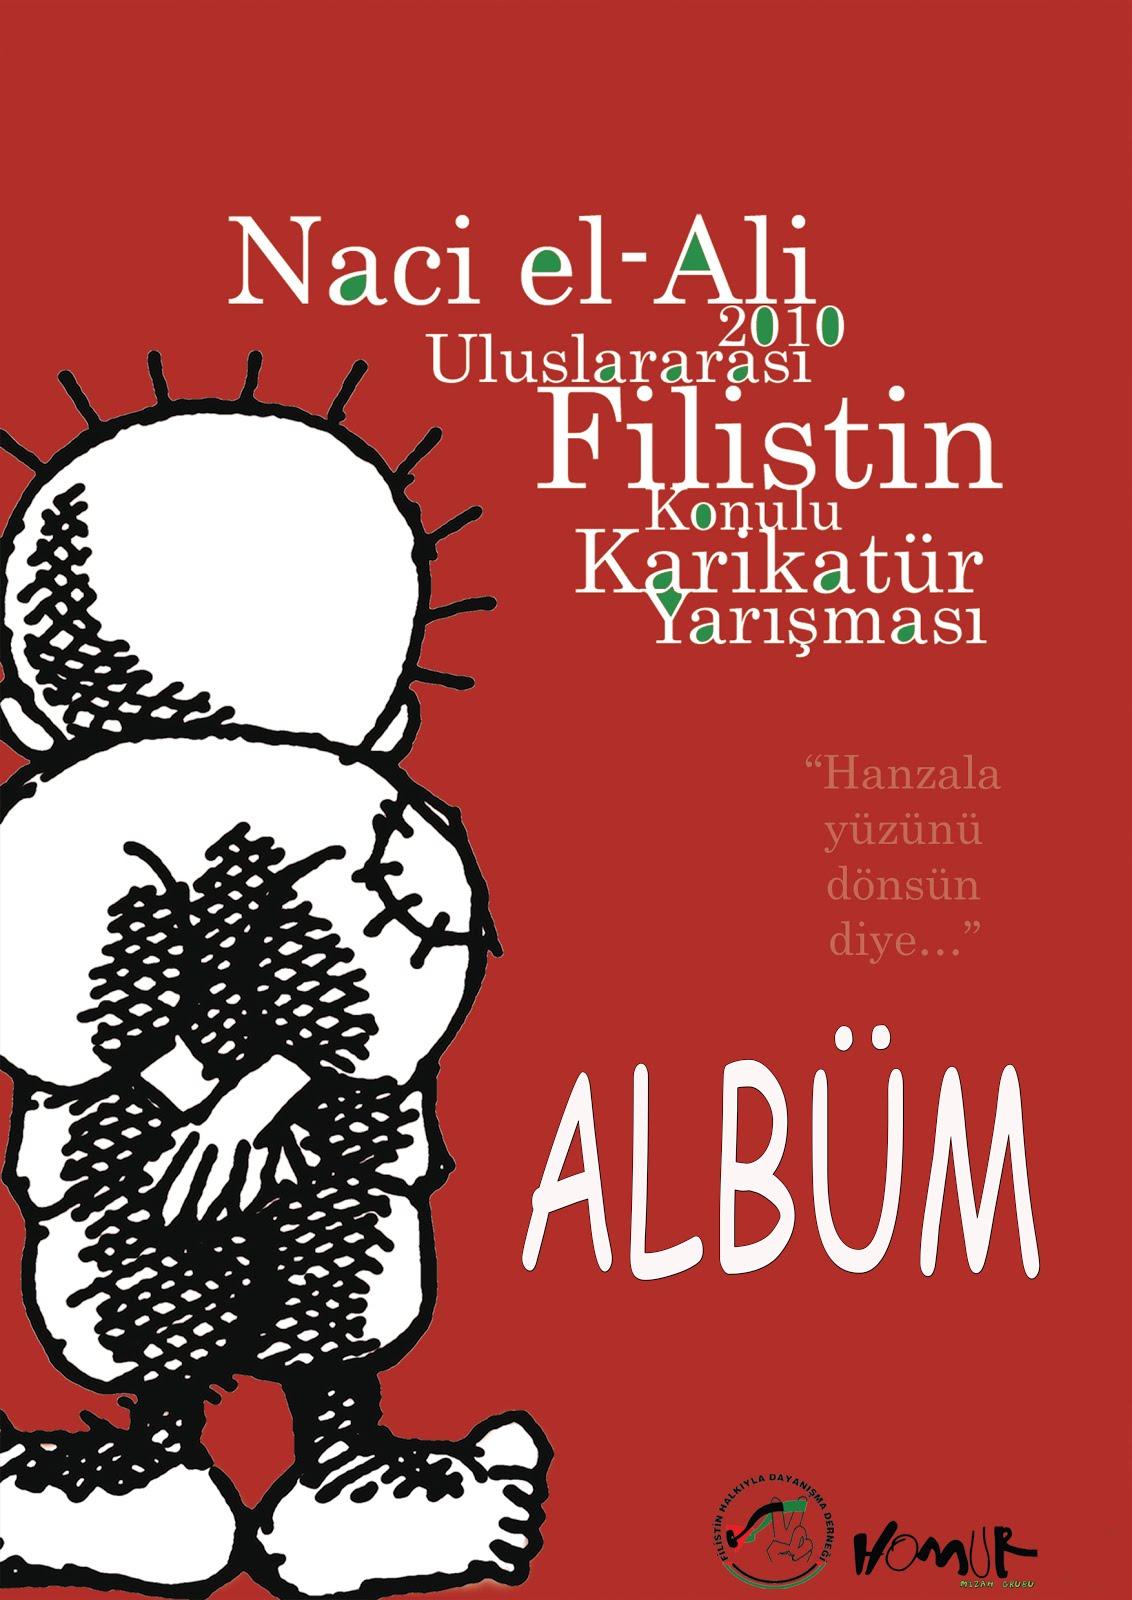 Naci El Ali Yarışması Albümü